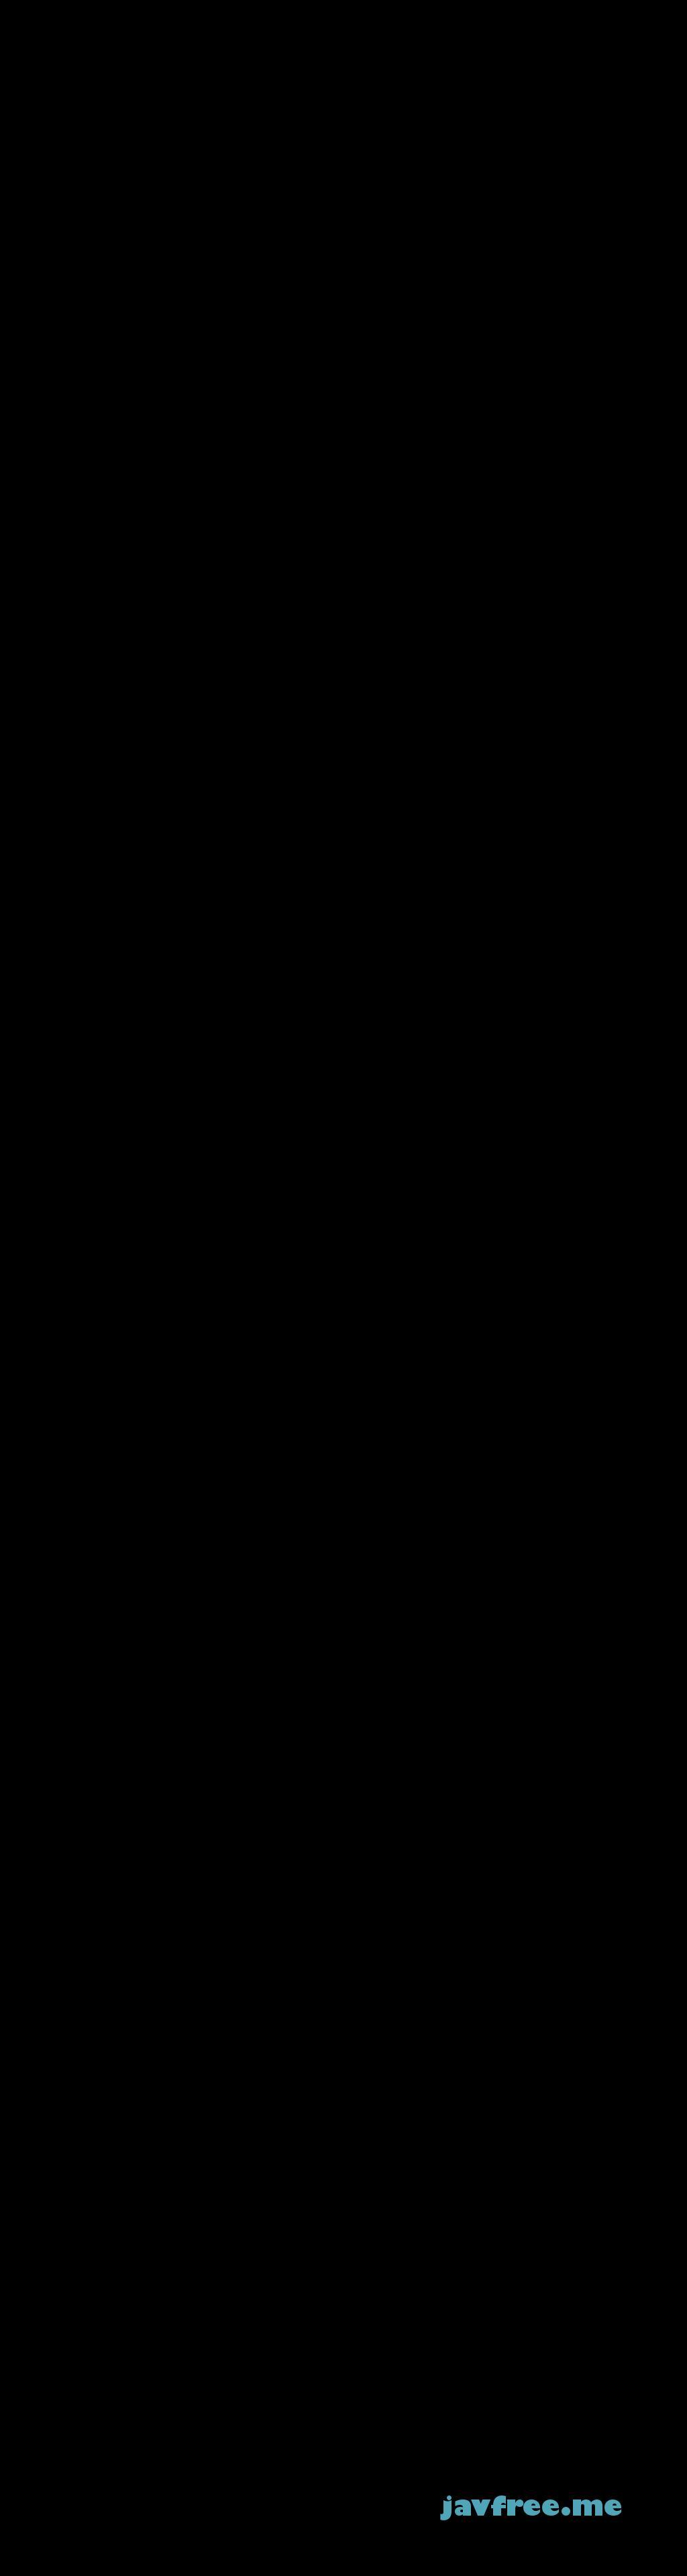 [AAJB-130] 【AV30】完全生涯保存版 永遠なる淫舞 美しき女神たち - image AAJB-130b on https://javfree.me